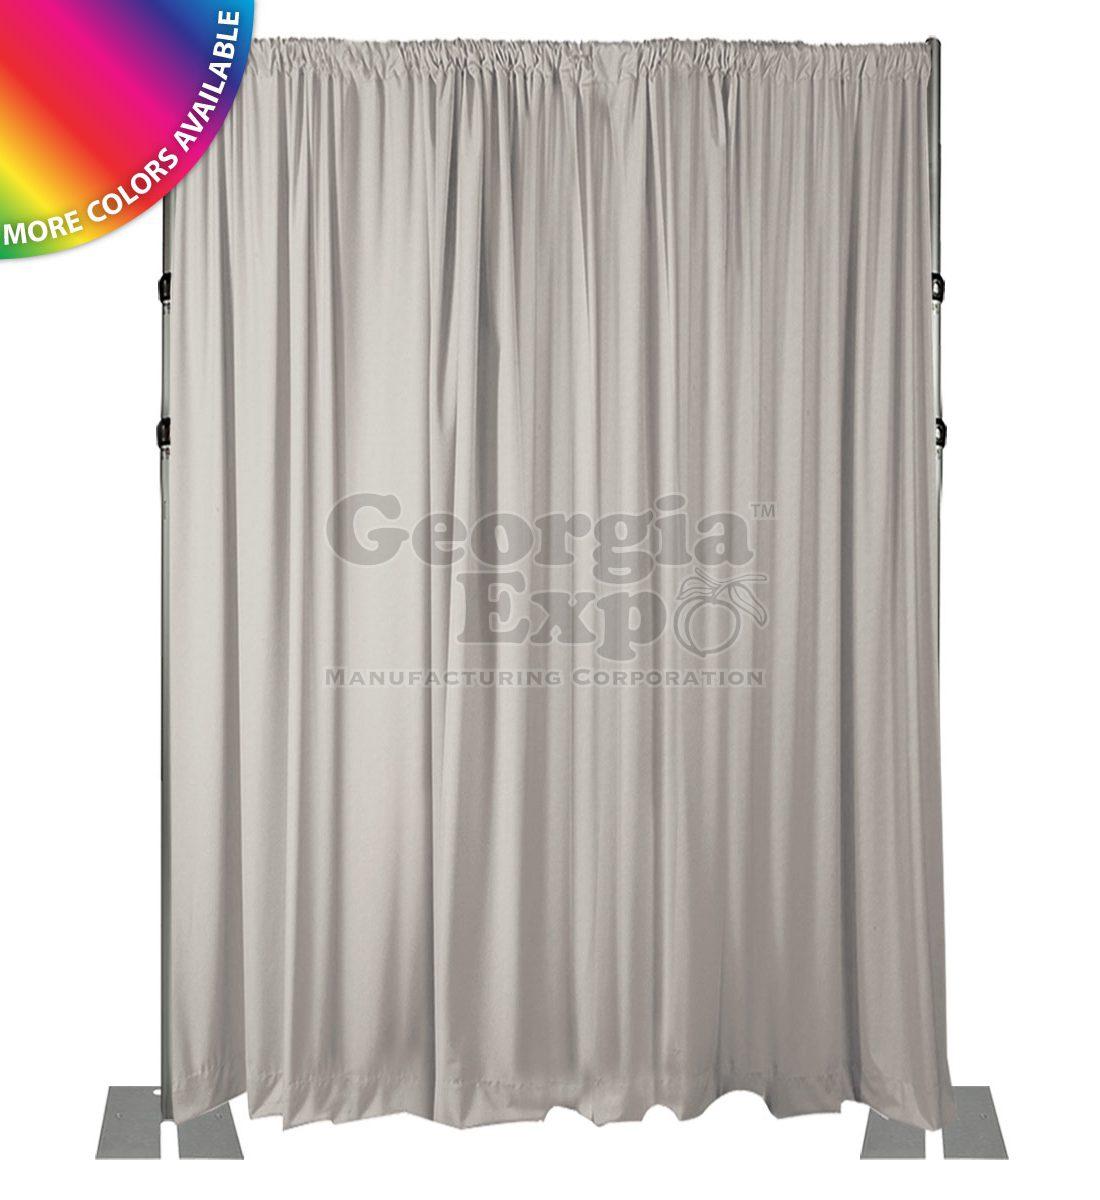 18 foot adjustable height back wall 3 piece uprights white drape  sc 1 st  Georgia Expo & Pipe and Drape Backdrop Kit u2013 18FT Slip Collar-Heavy Duty Adjustable ...